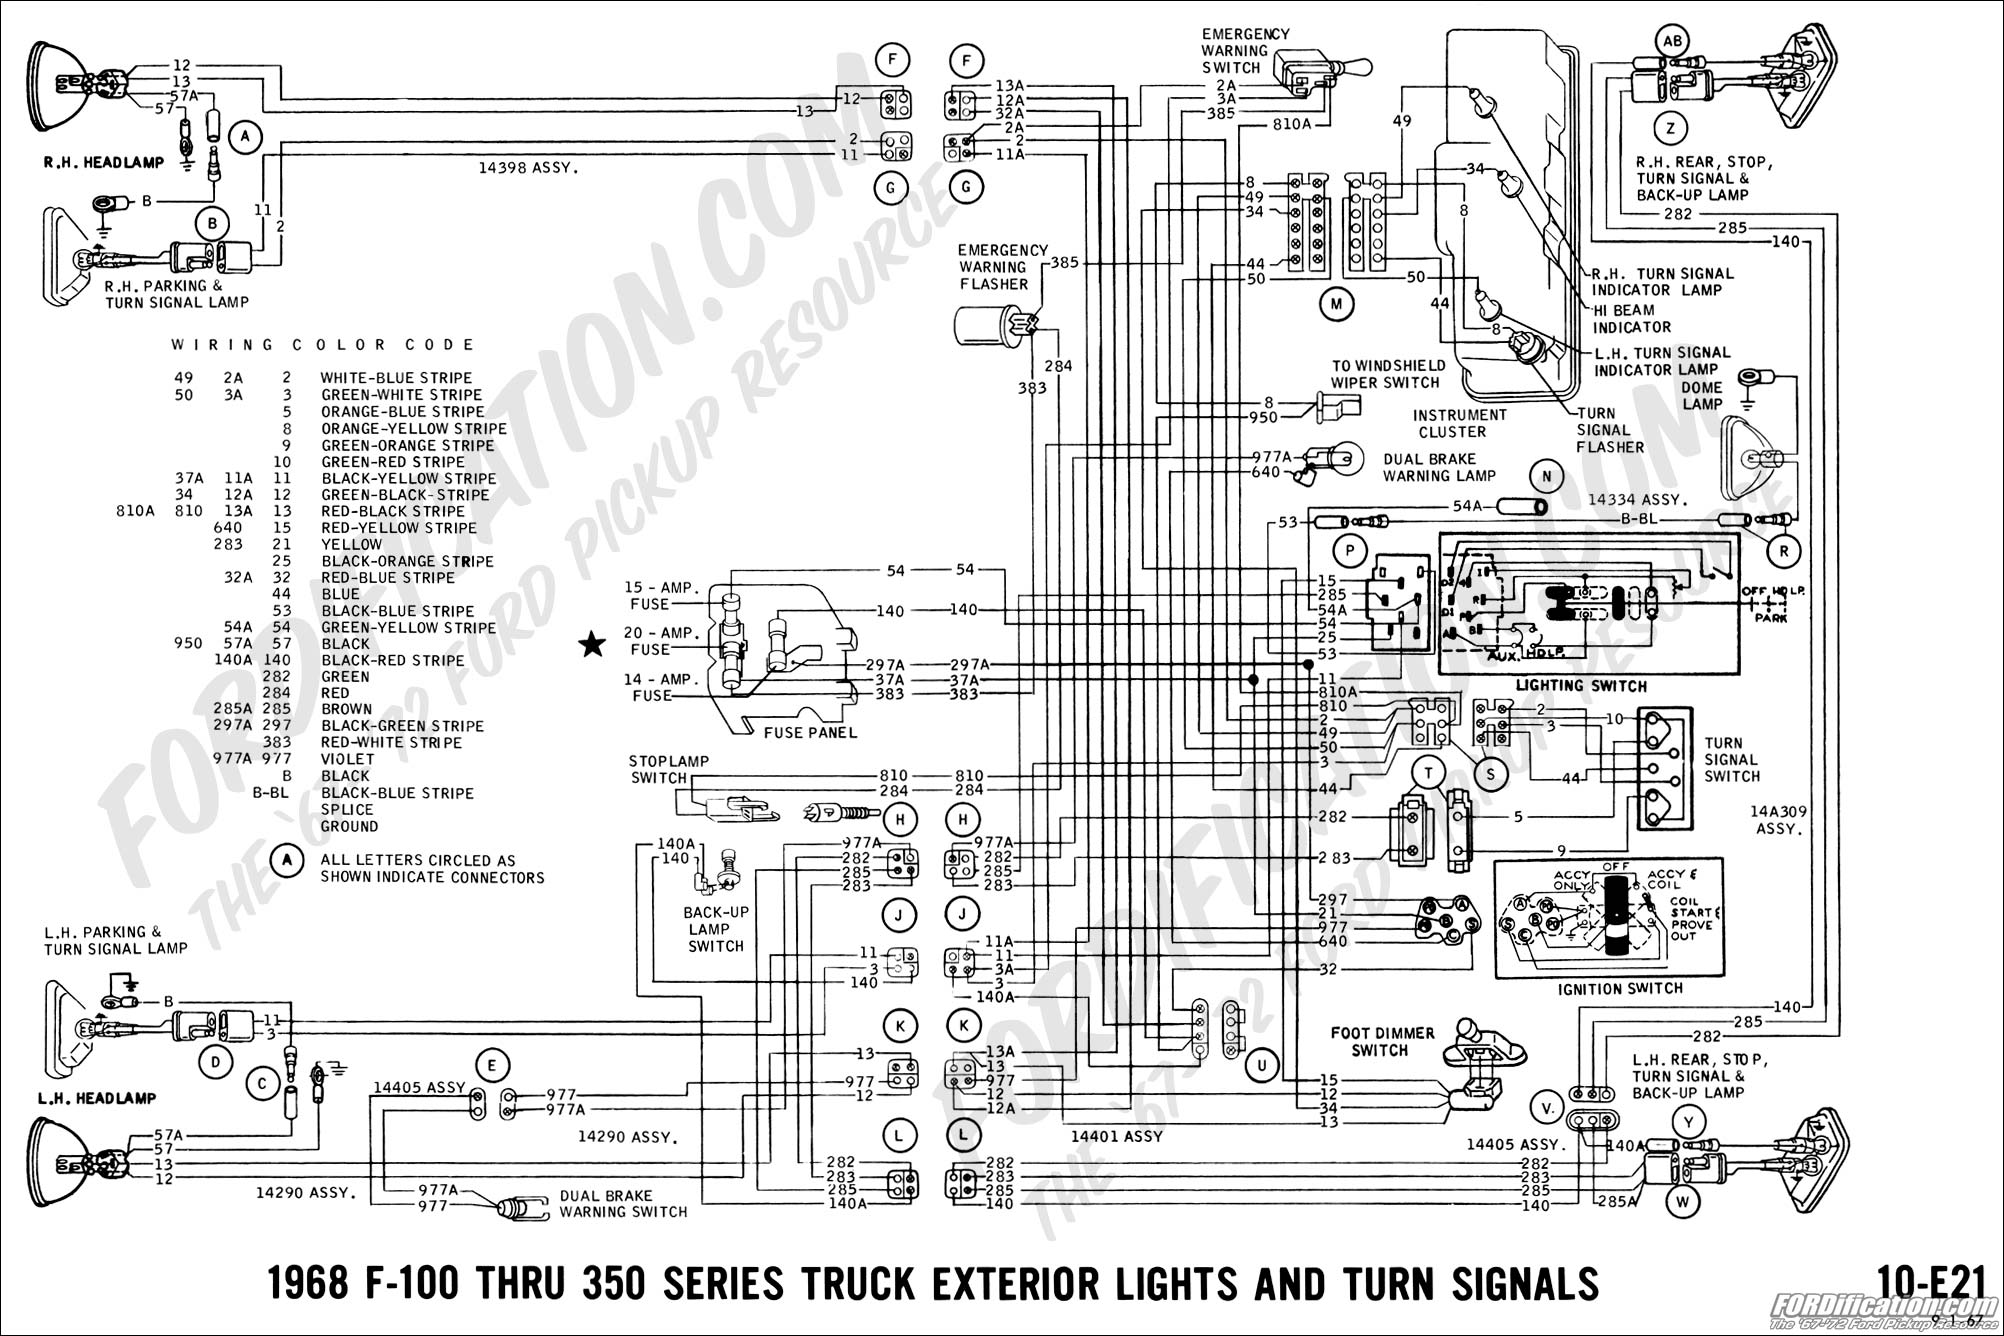 2011 Ford Thunderbird Convertible